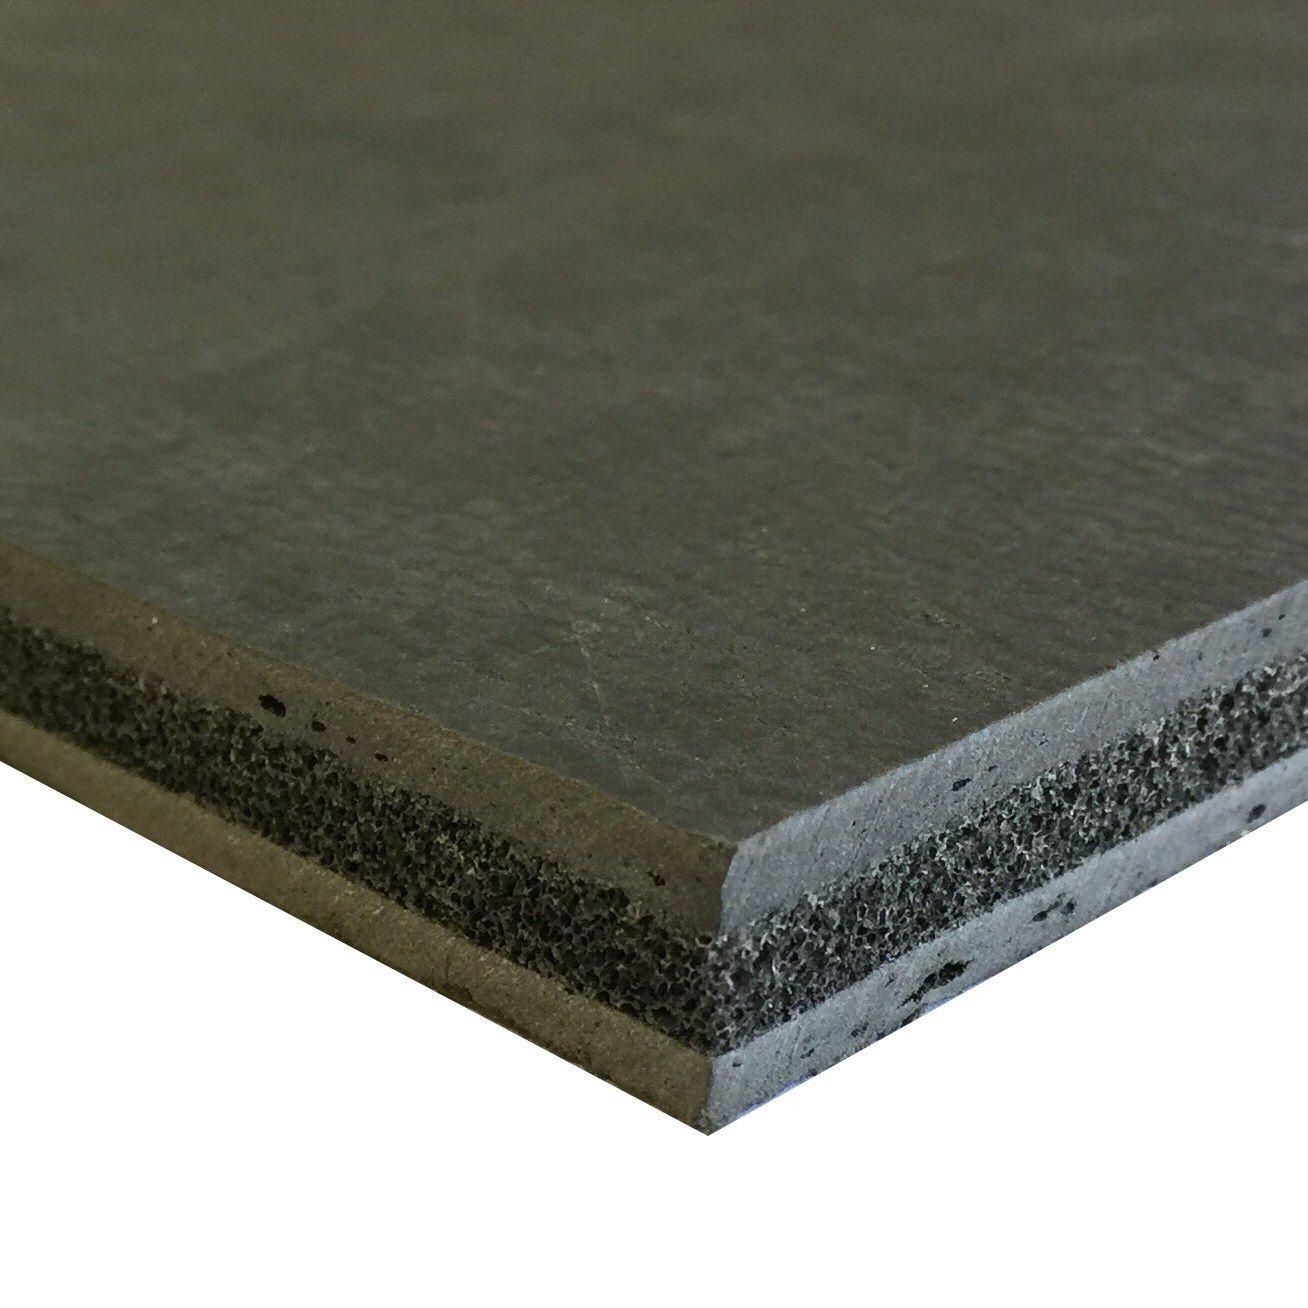 Noisestop Acoustic Underlay 12mm, Soundproof Underlay For Laminate Flooring